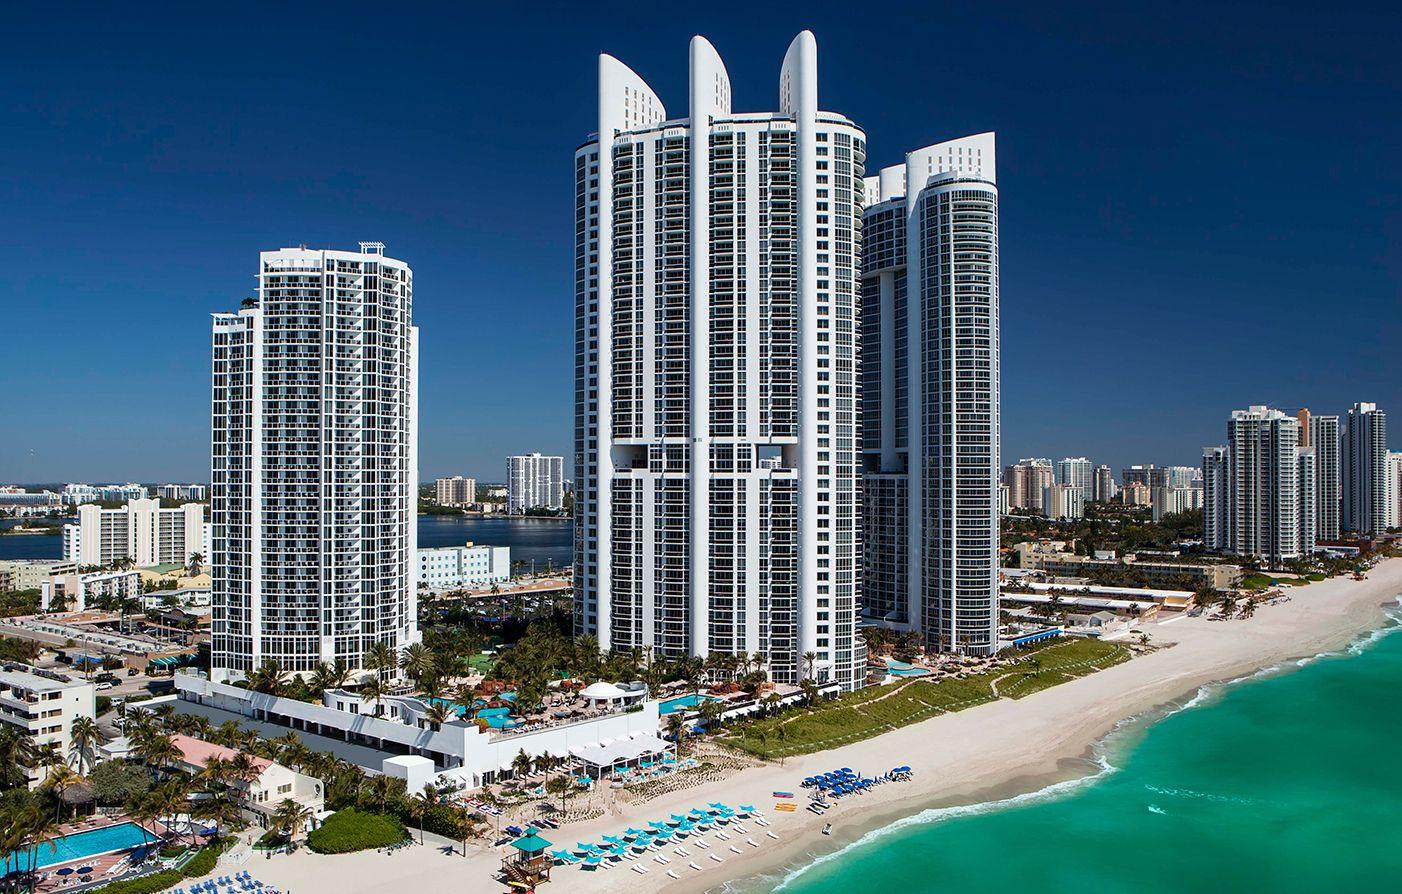 Congratulations Preferred Hotel Group On Trump International Beach Resort Earning The Startle